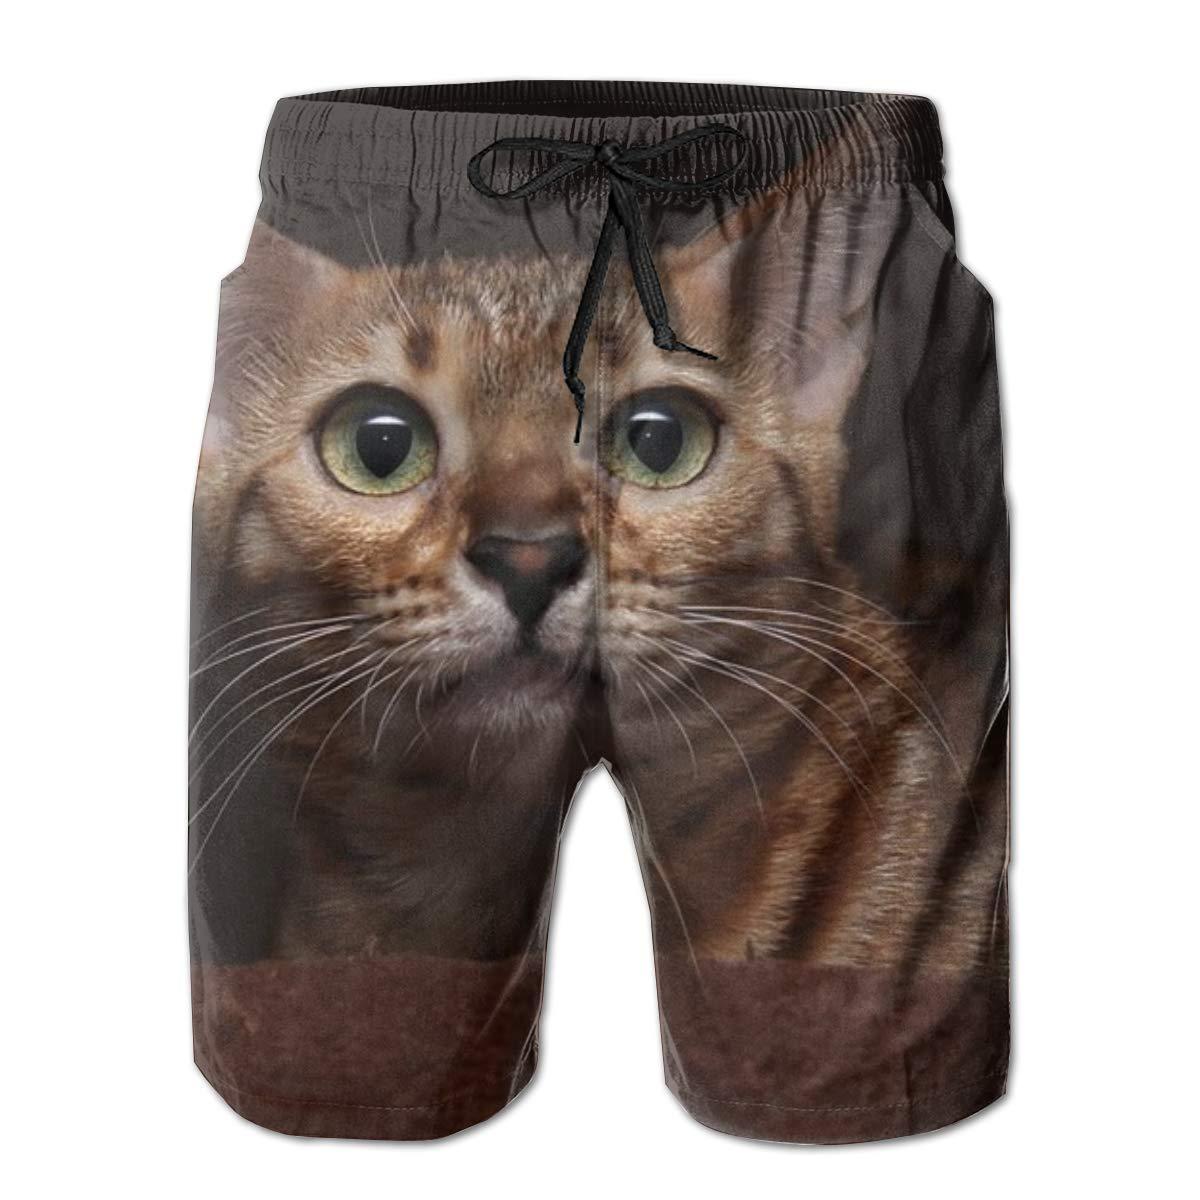 Male Beachwear Swimtrunks Cat Drawstring Elastic Waist Running Beach Summer Outfit Pants